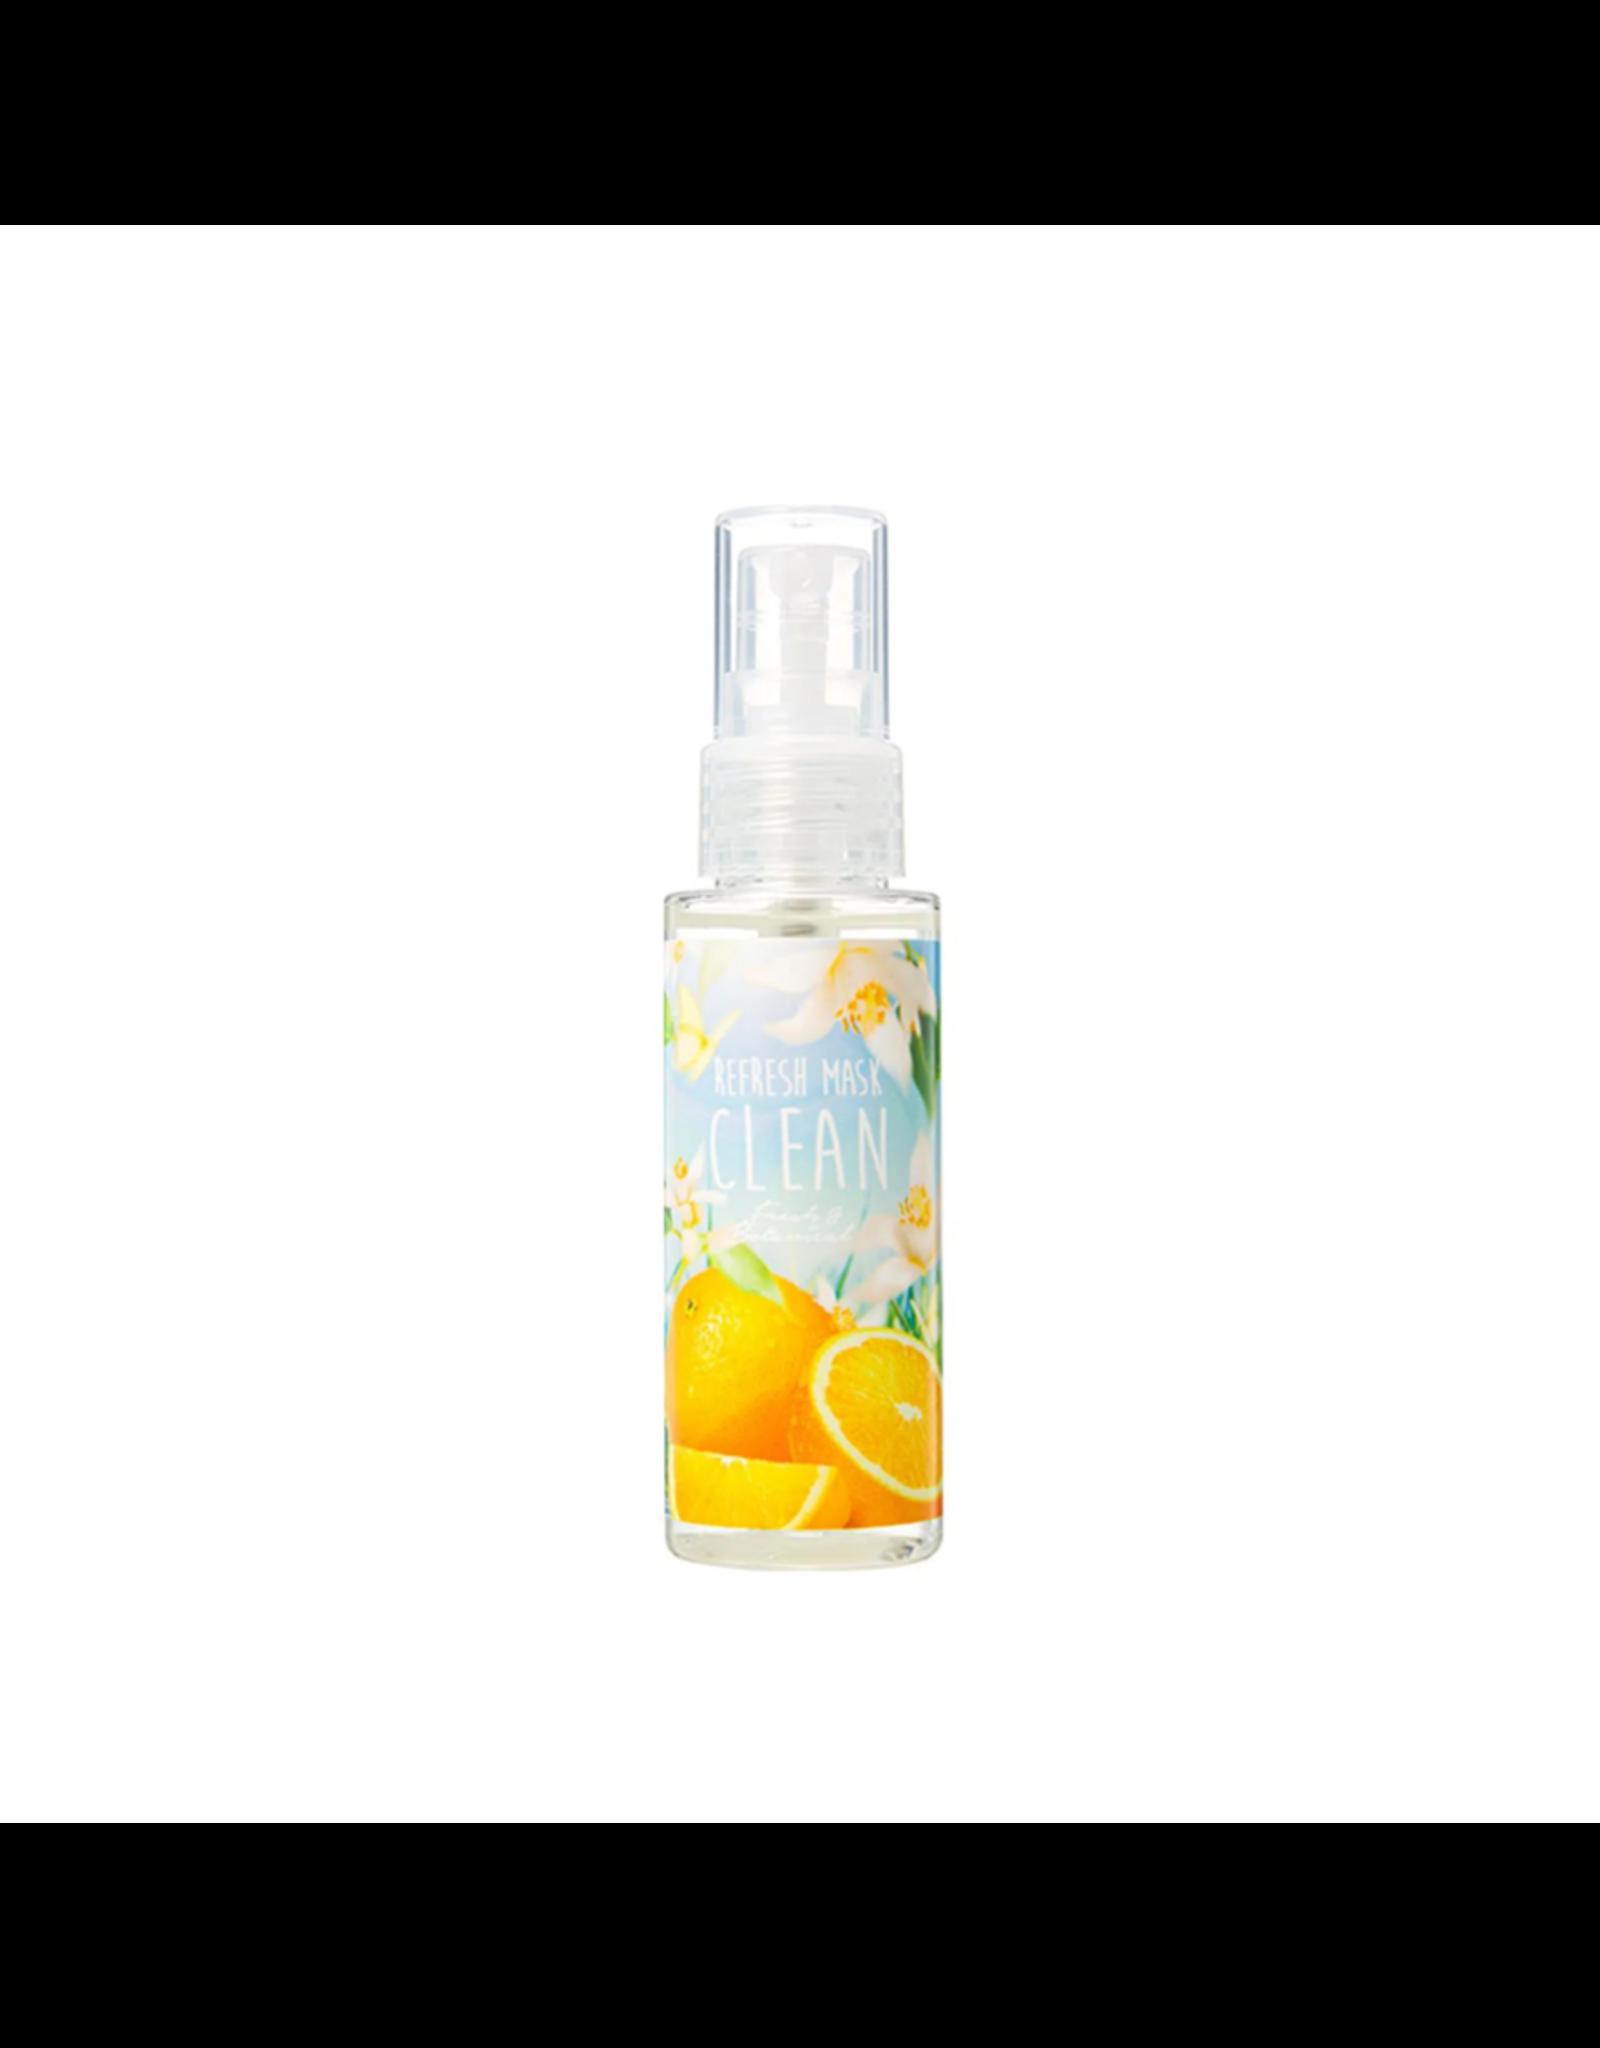 CLEAN Fresh & Botanical Clean Original Mask Spray